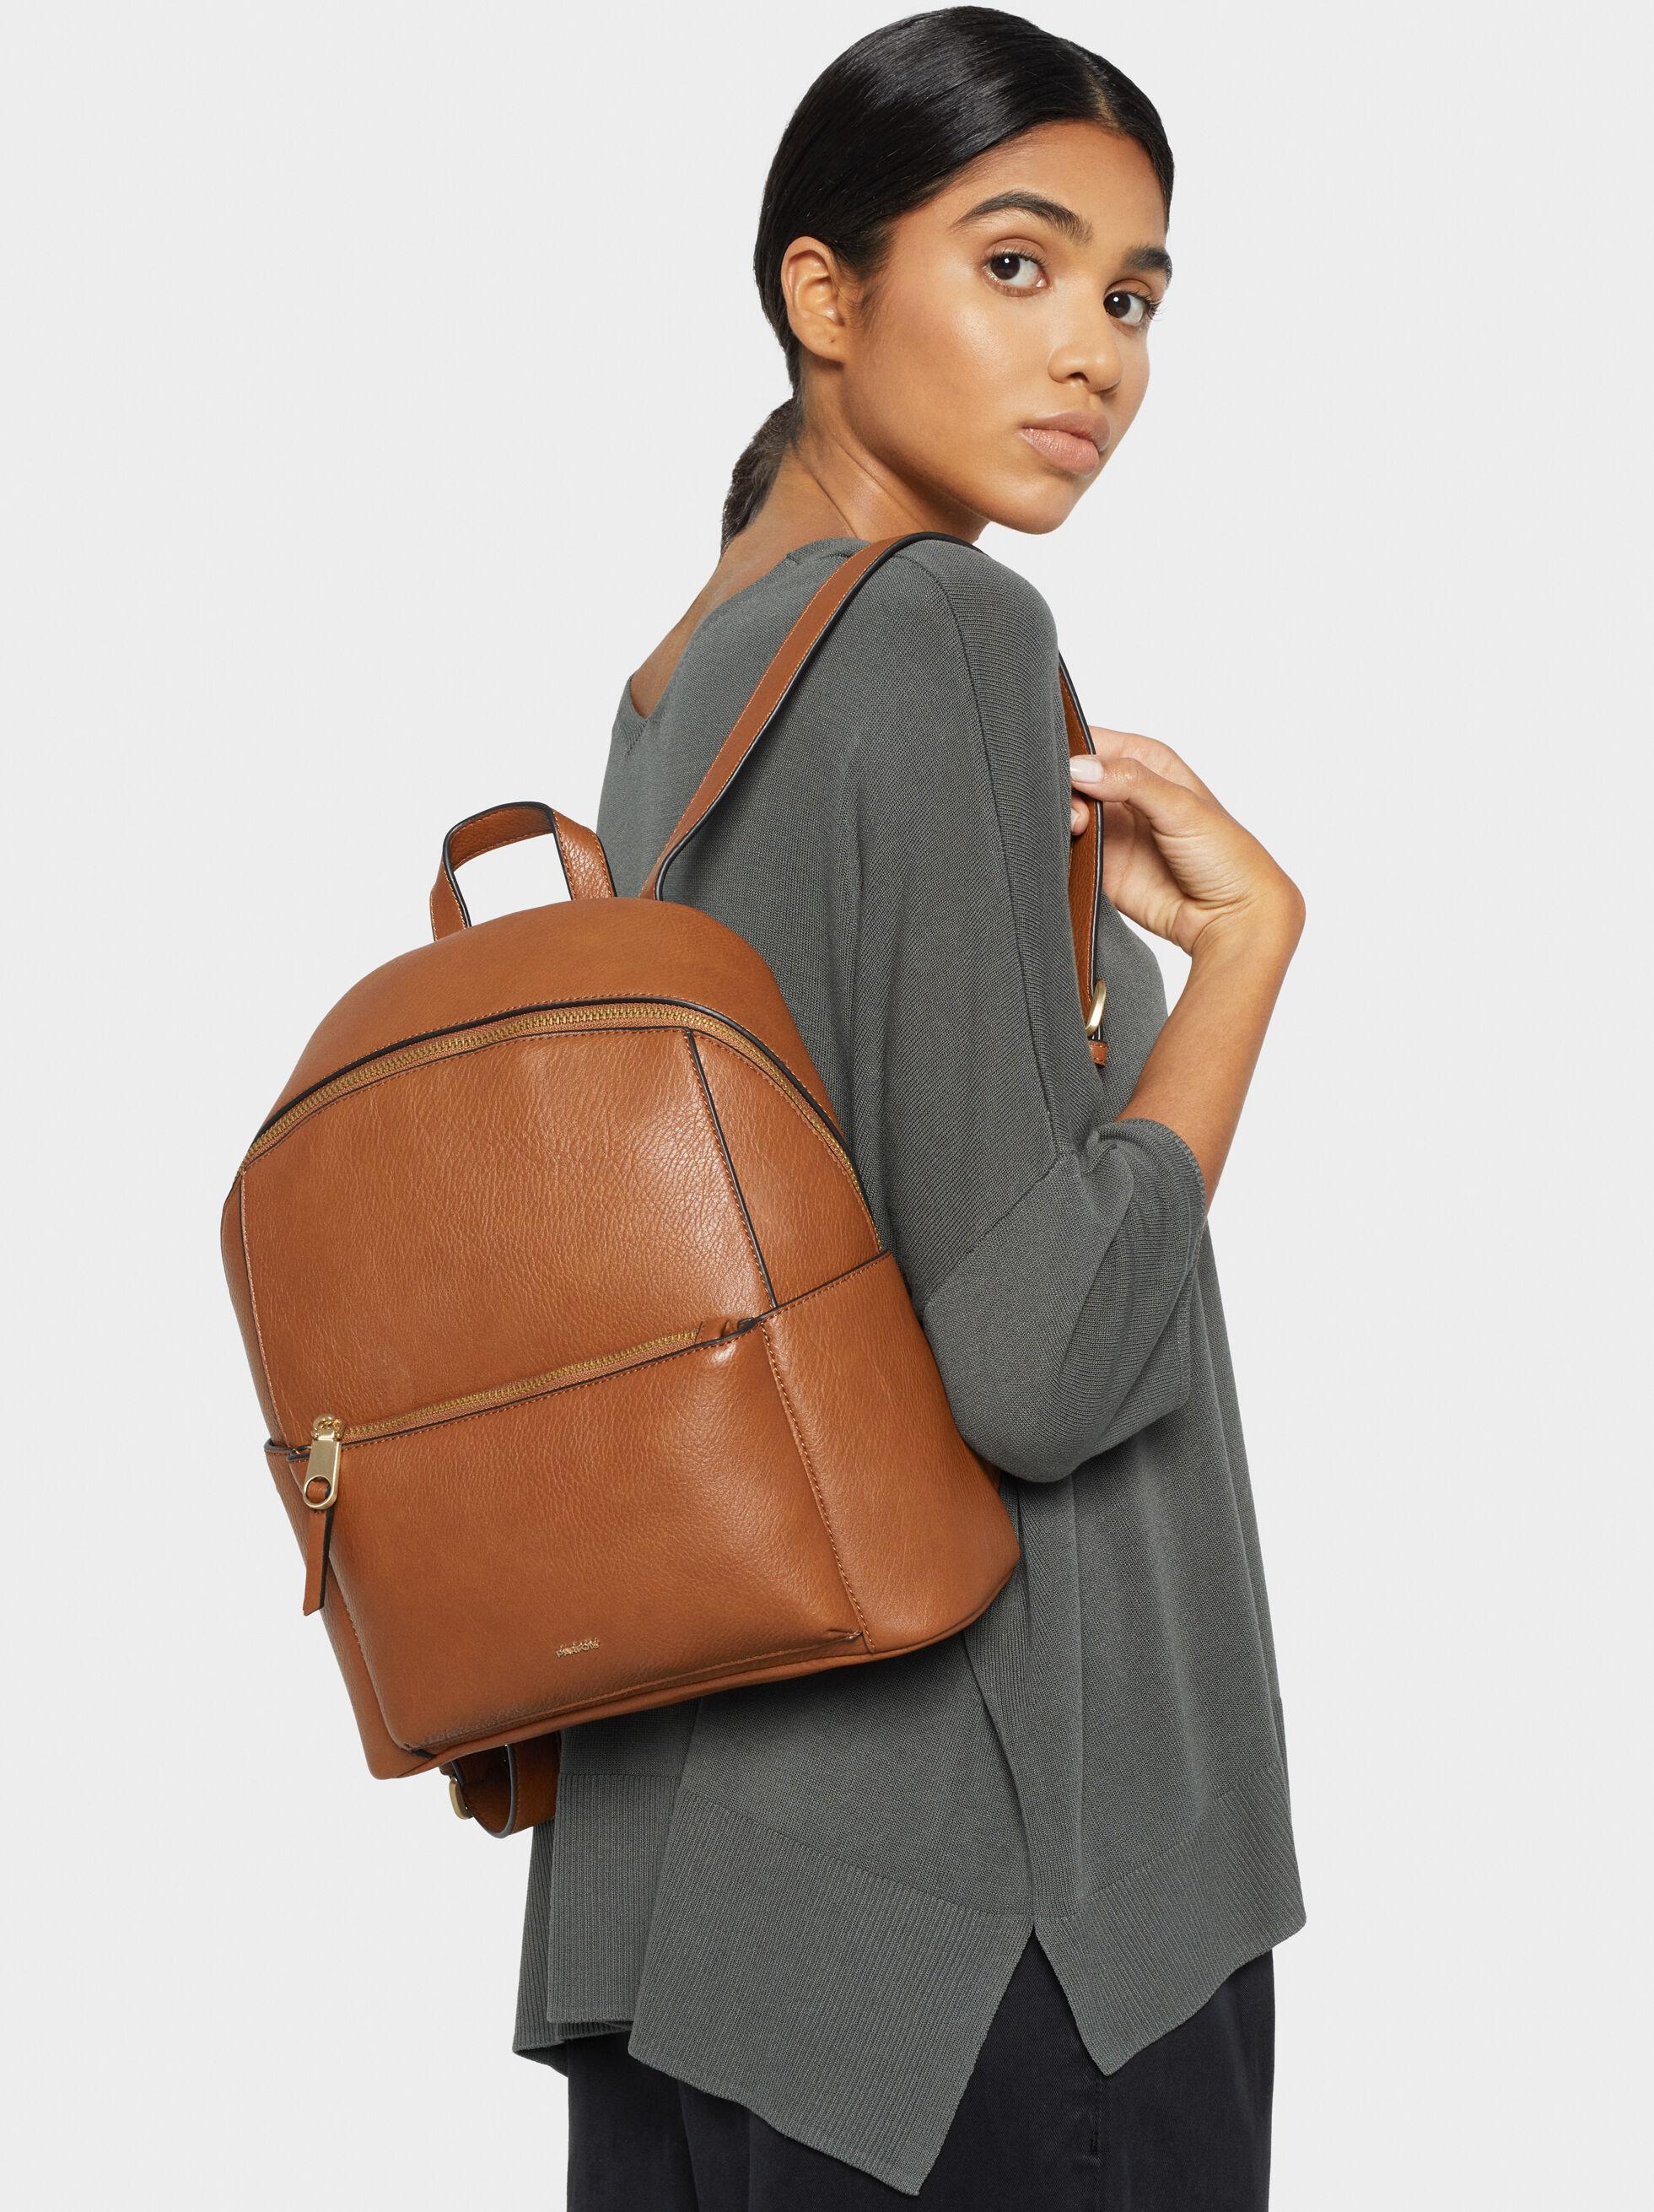 Backpack With Outer Pocket, , hi-res